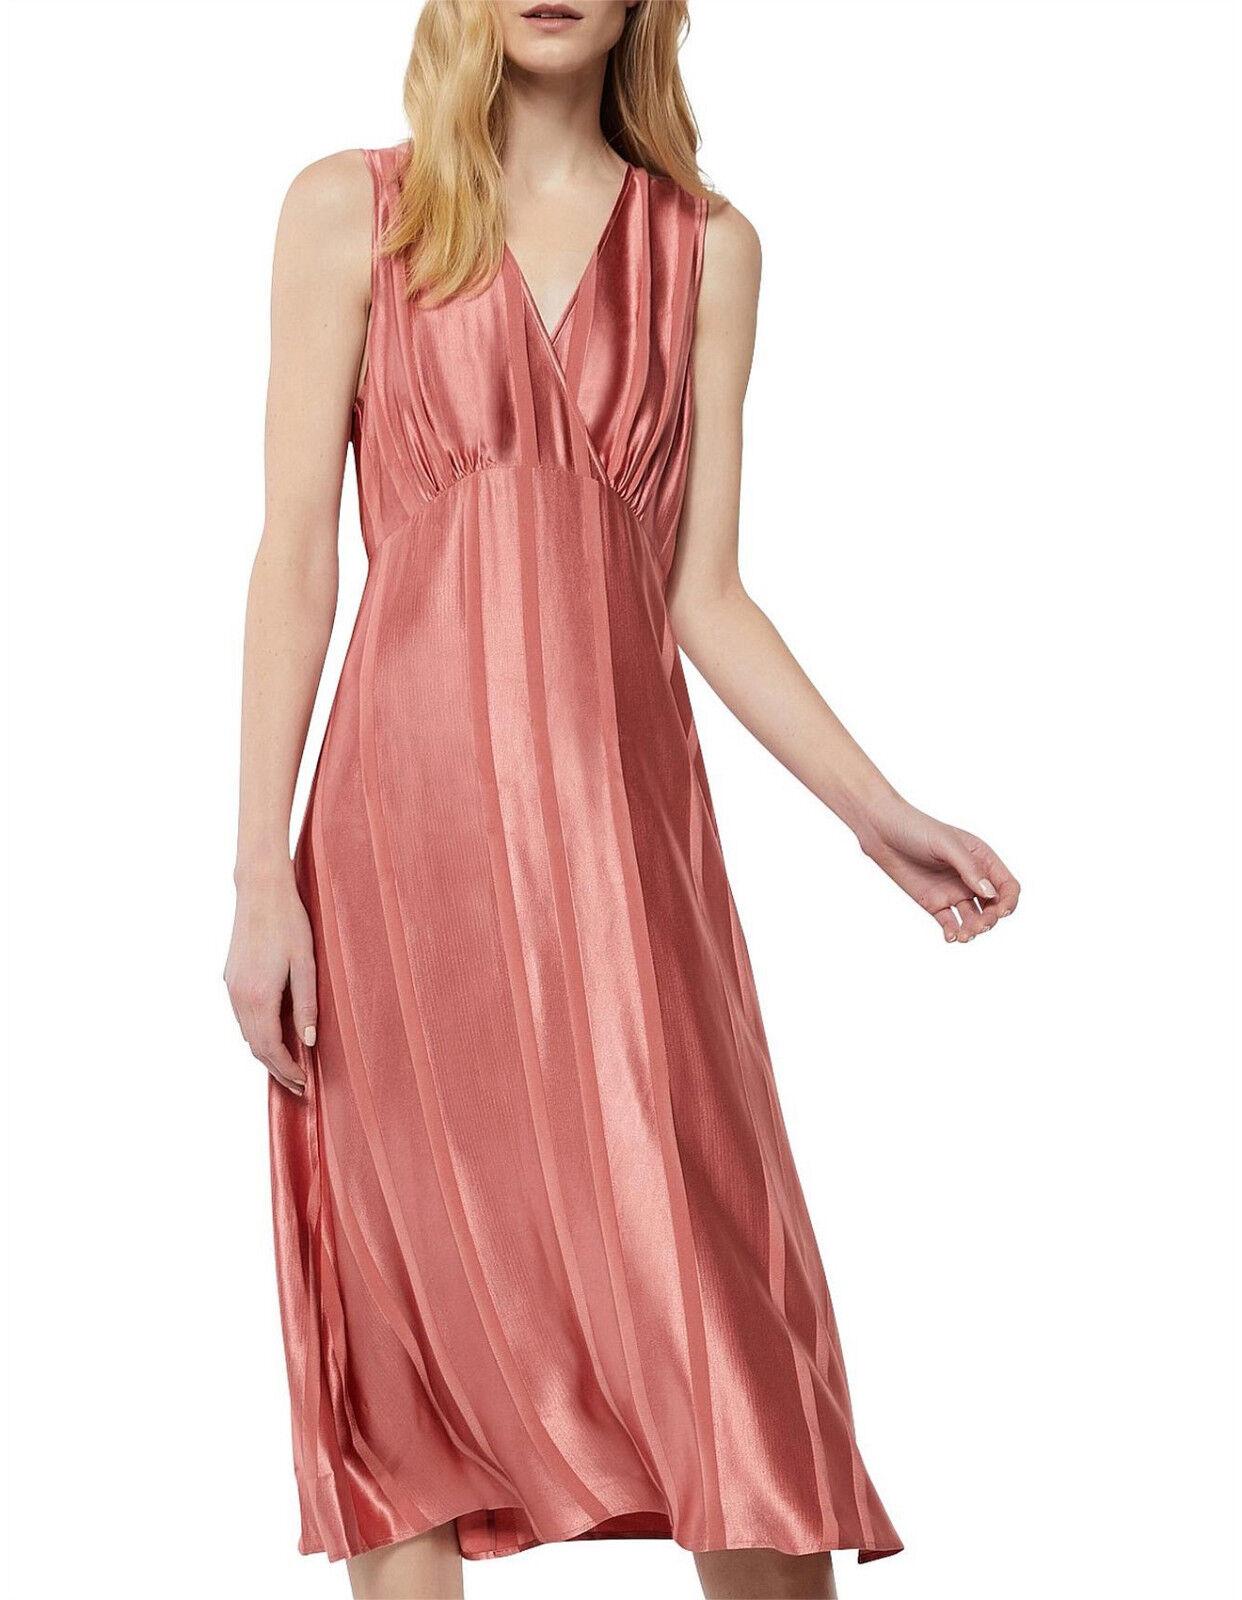 NEW NWT  WITCHERY Crotver Gatherot Midi Dress   Rich Rosa  10 12 14 16